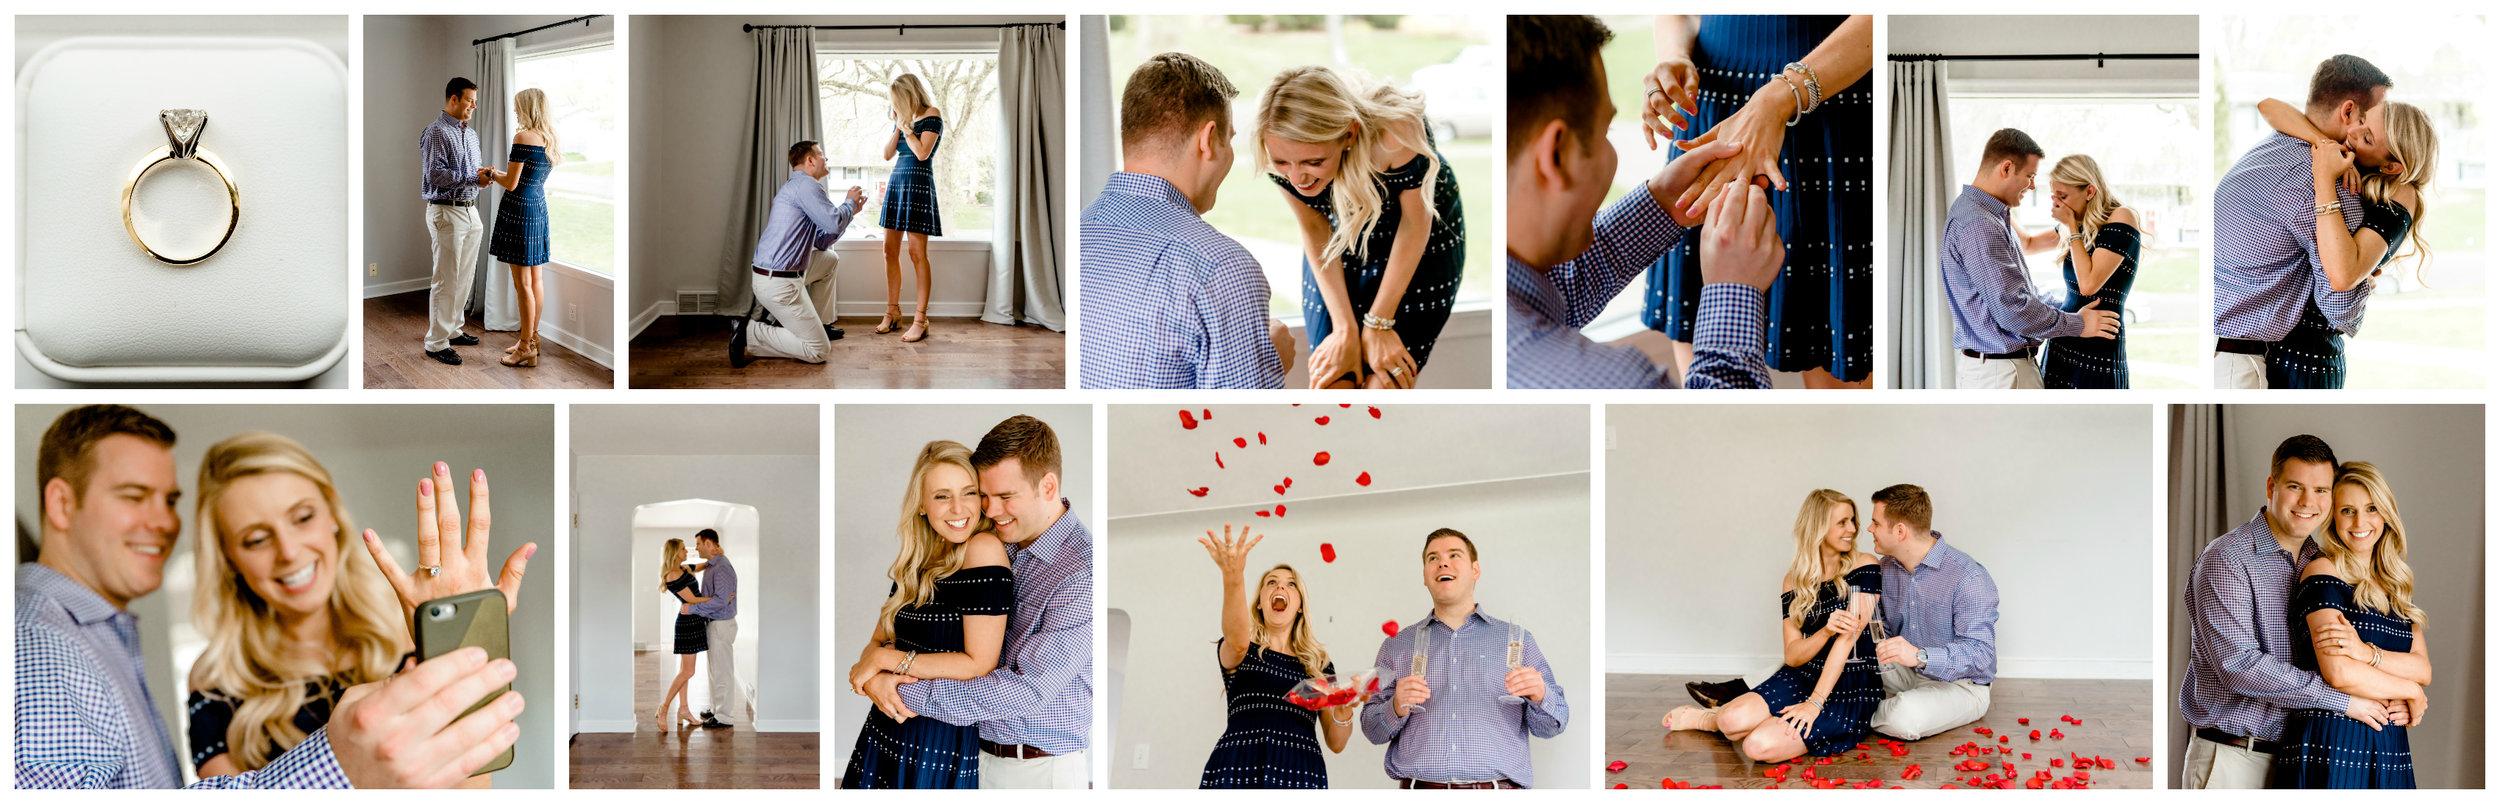 Proposal Collage 2.jpg